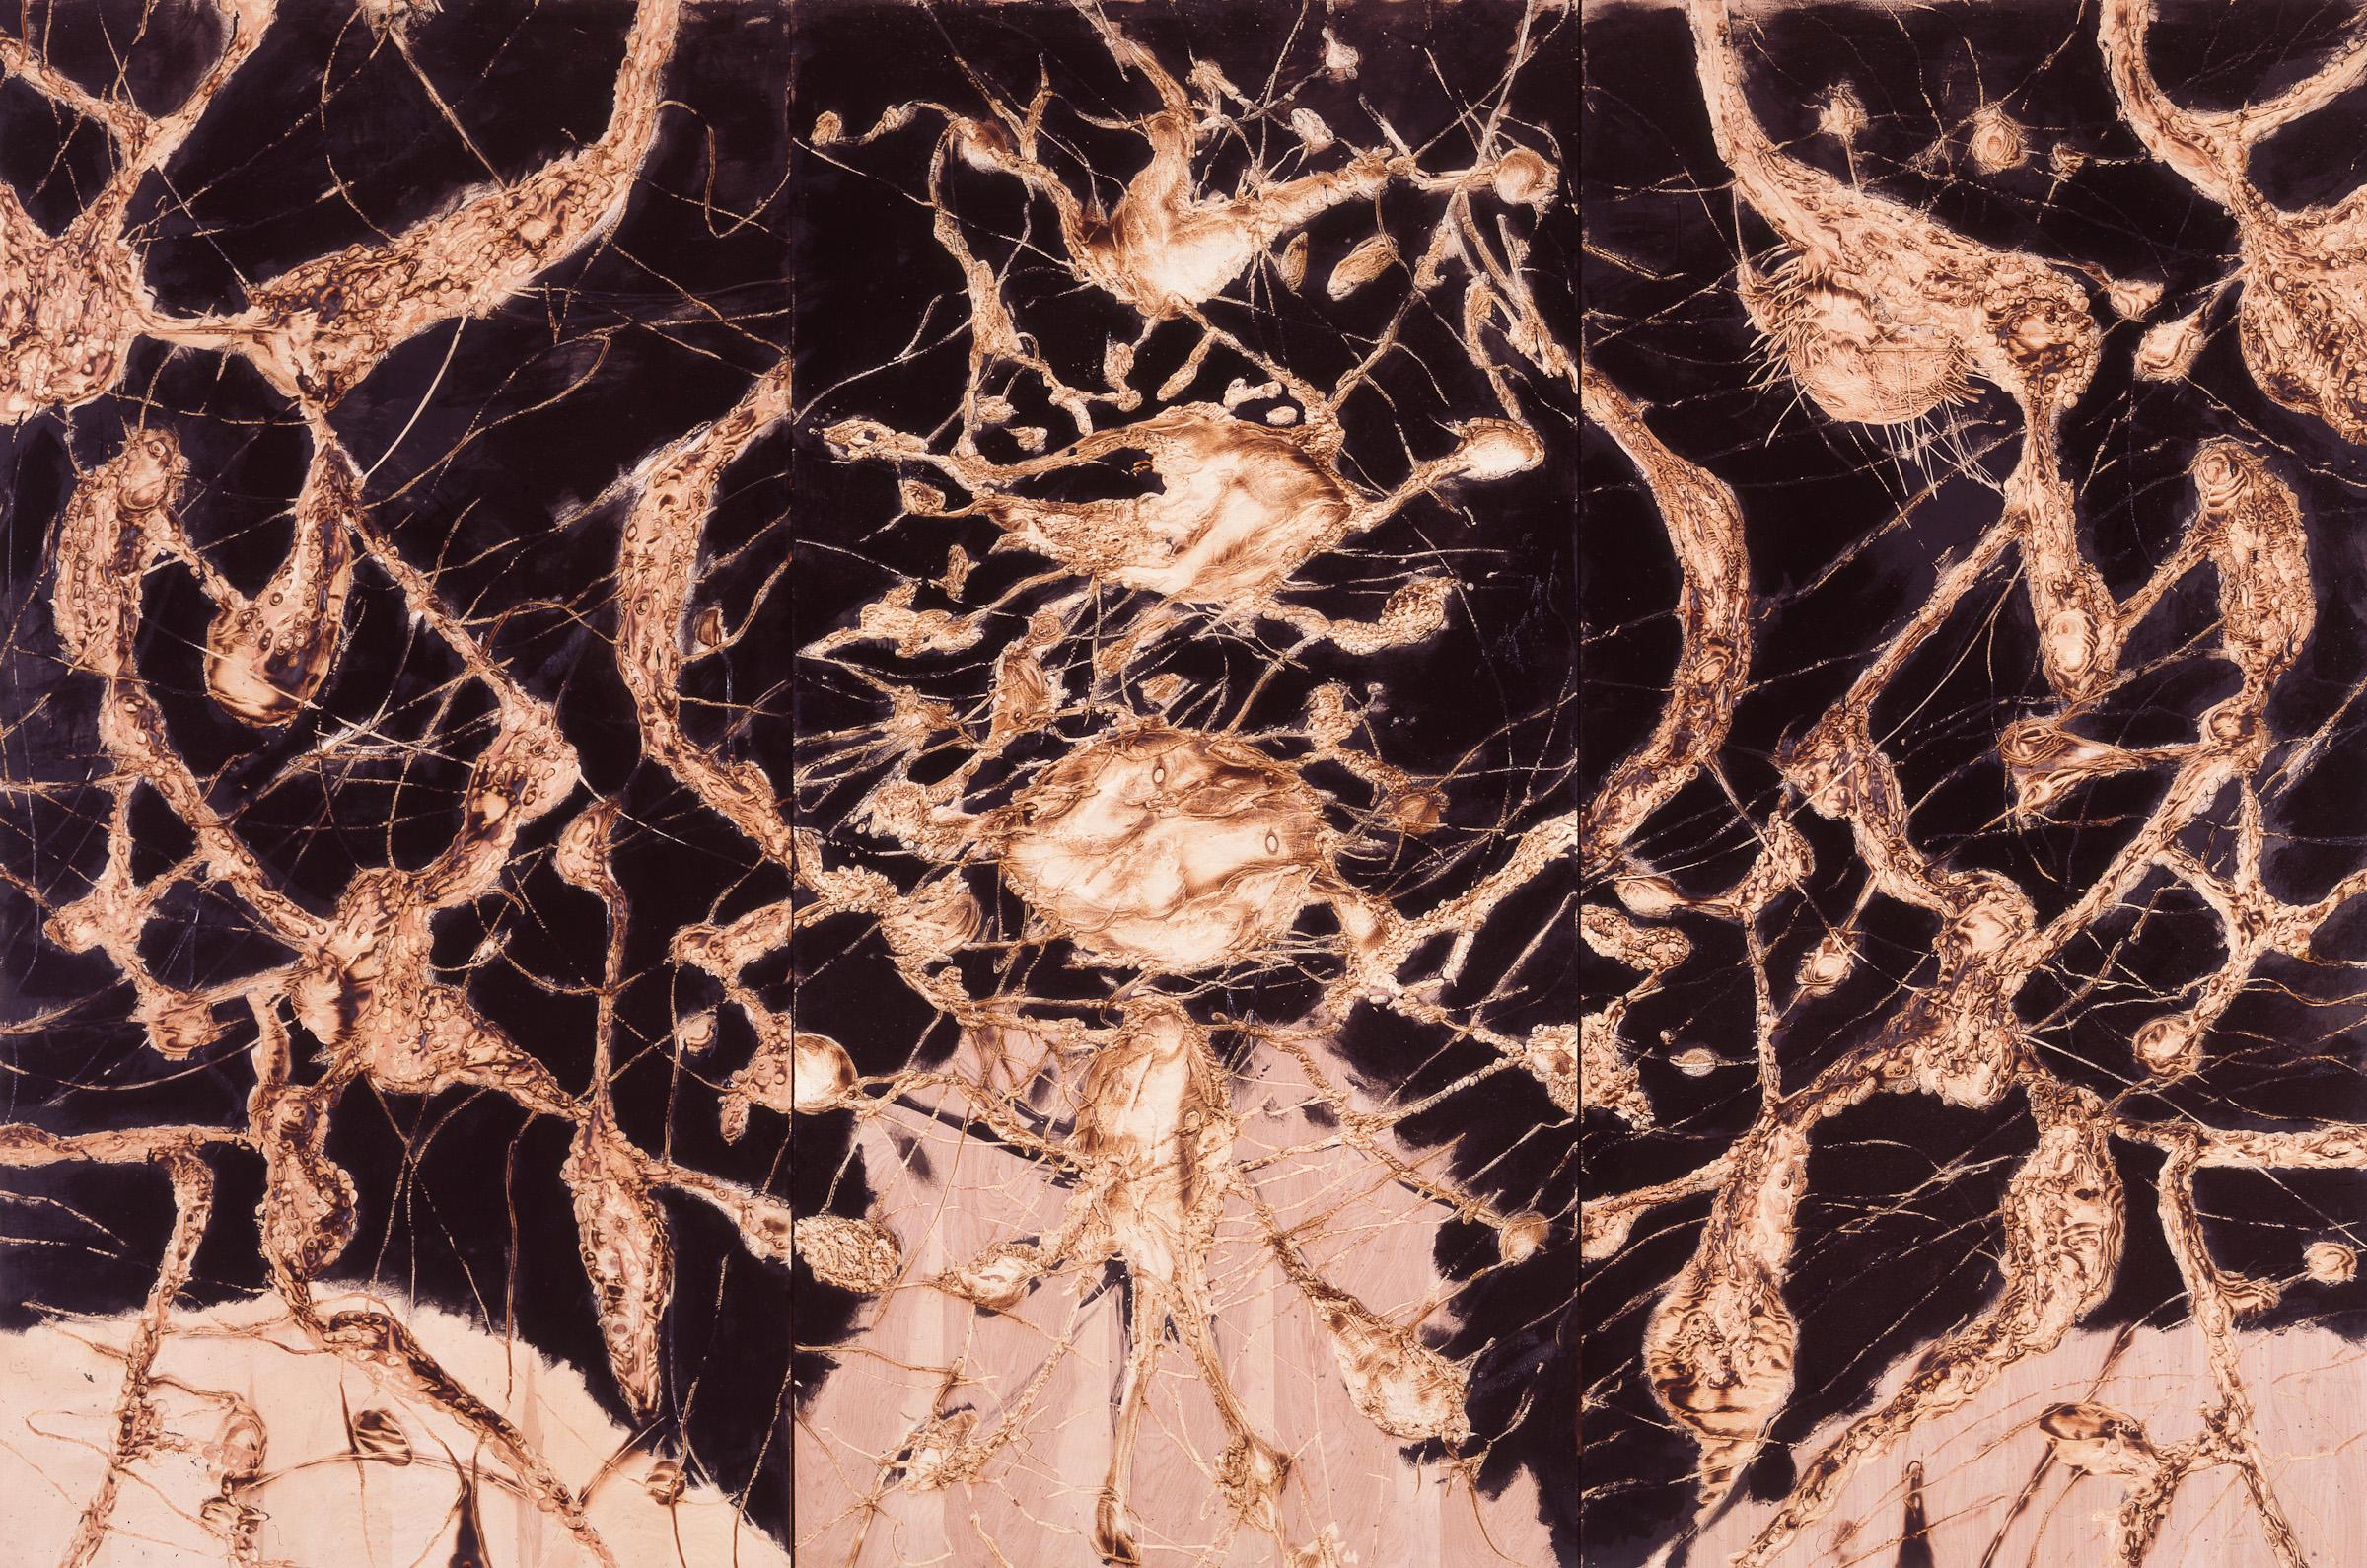 Untitled_1993_4x5_166.jpg